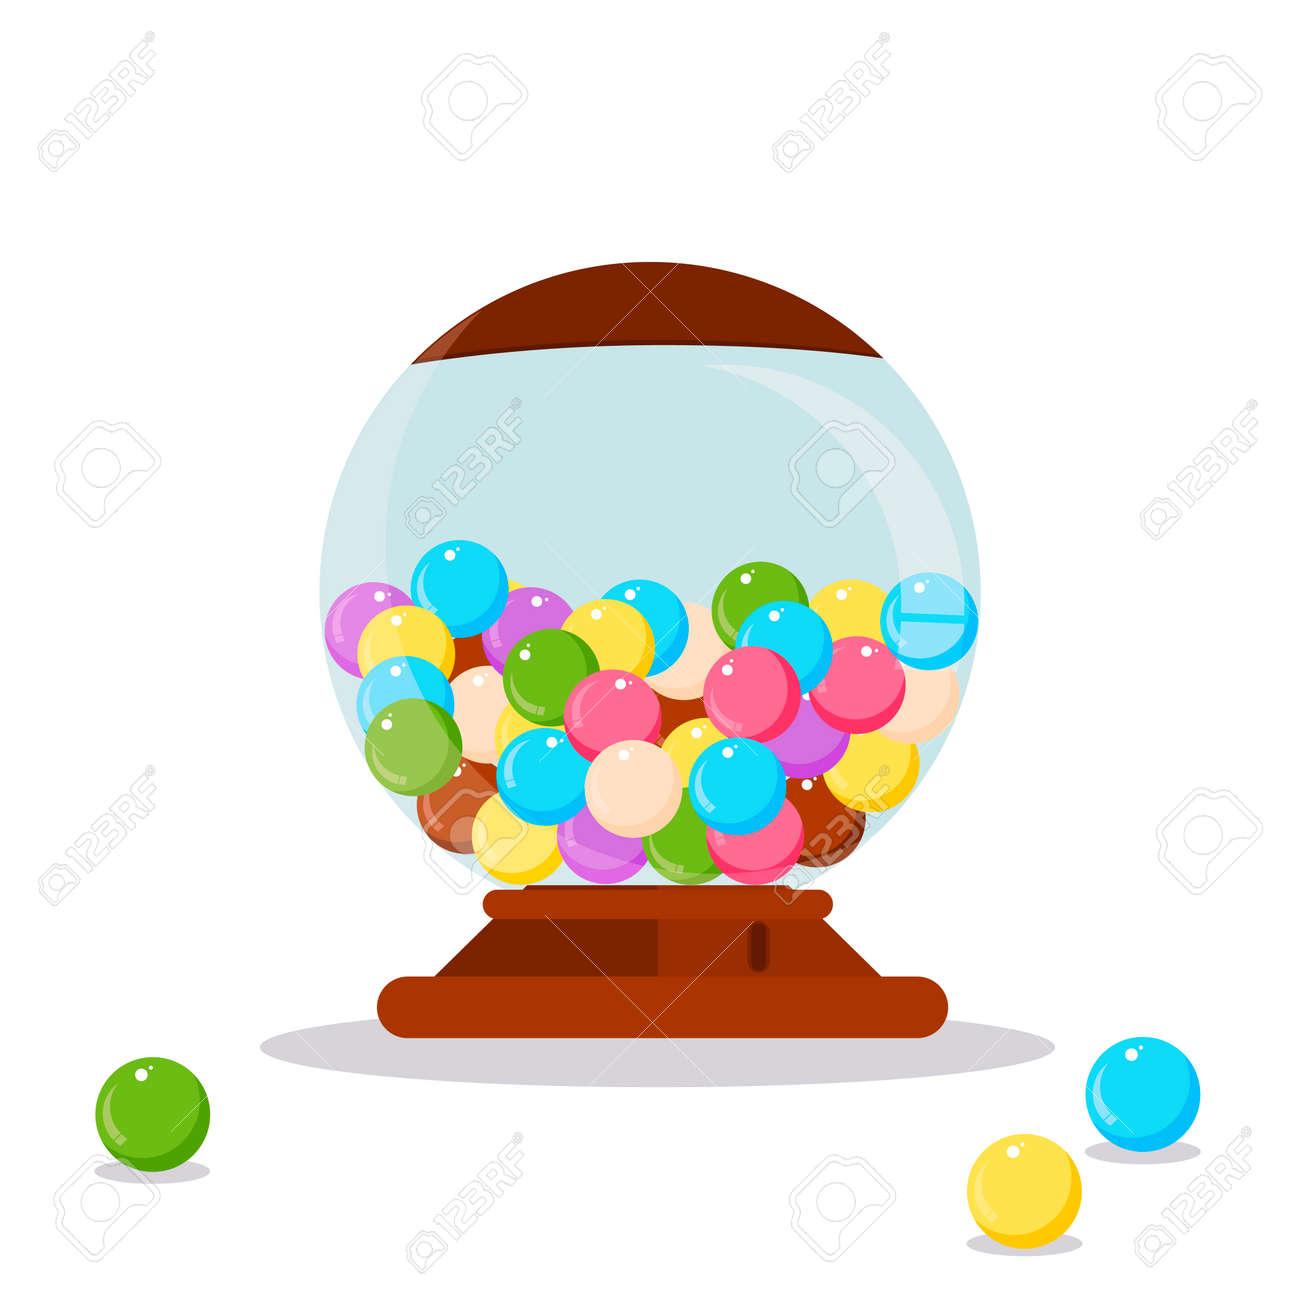 Vector Gumball Machine illustration. Gumball, bubblegum machine, dispenser vector illustration. Funny Gumball Machine. Gumball Machine colorful candy. Gumball Machine. Gumball Machine design. - 55499925